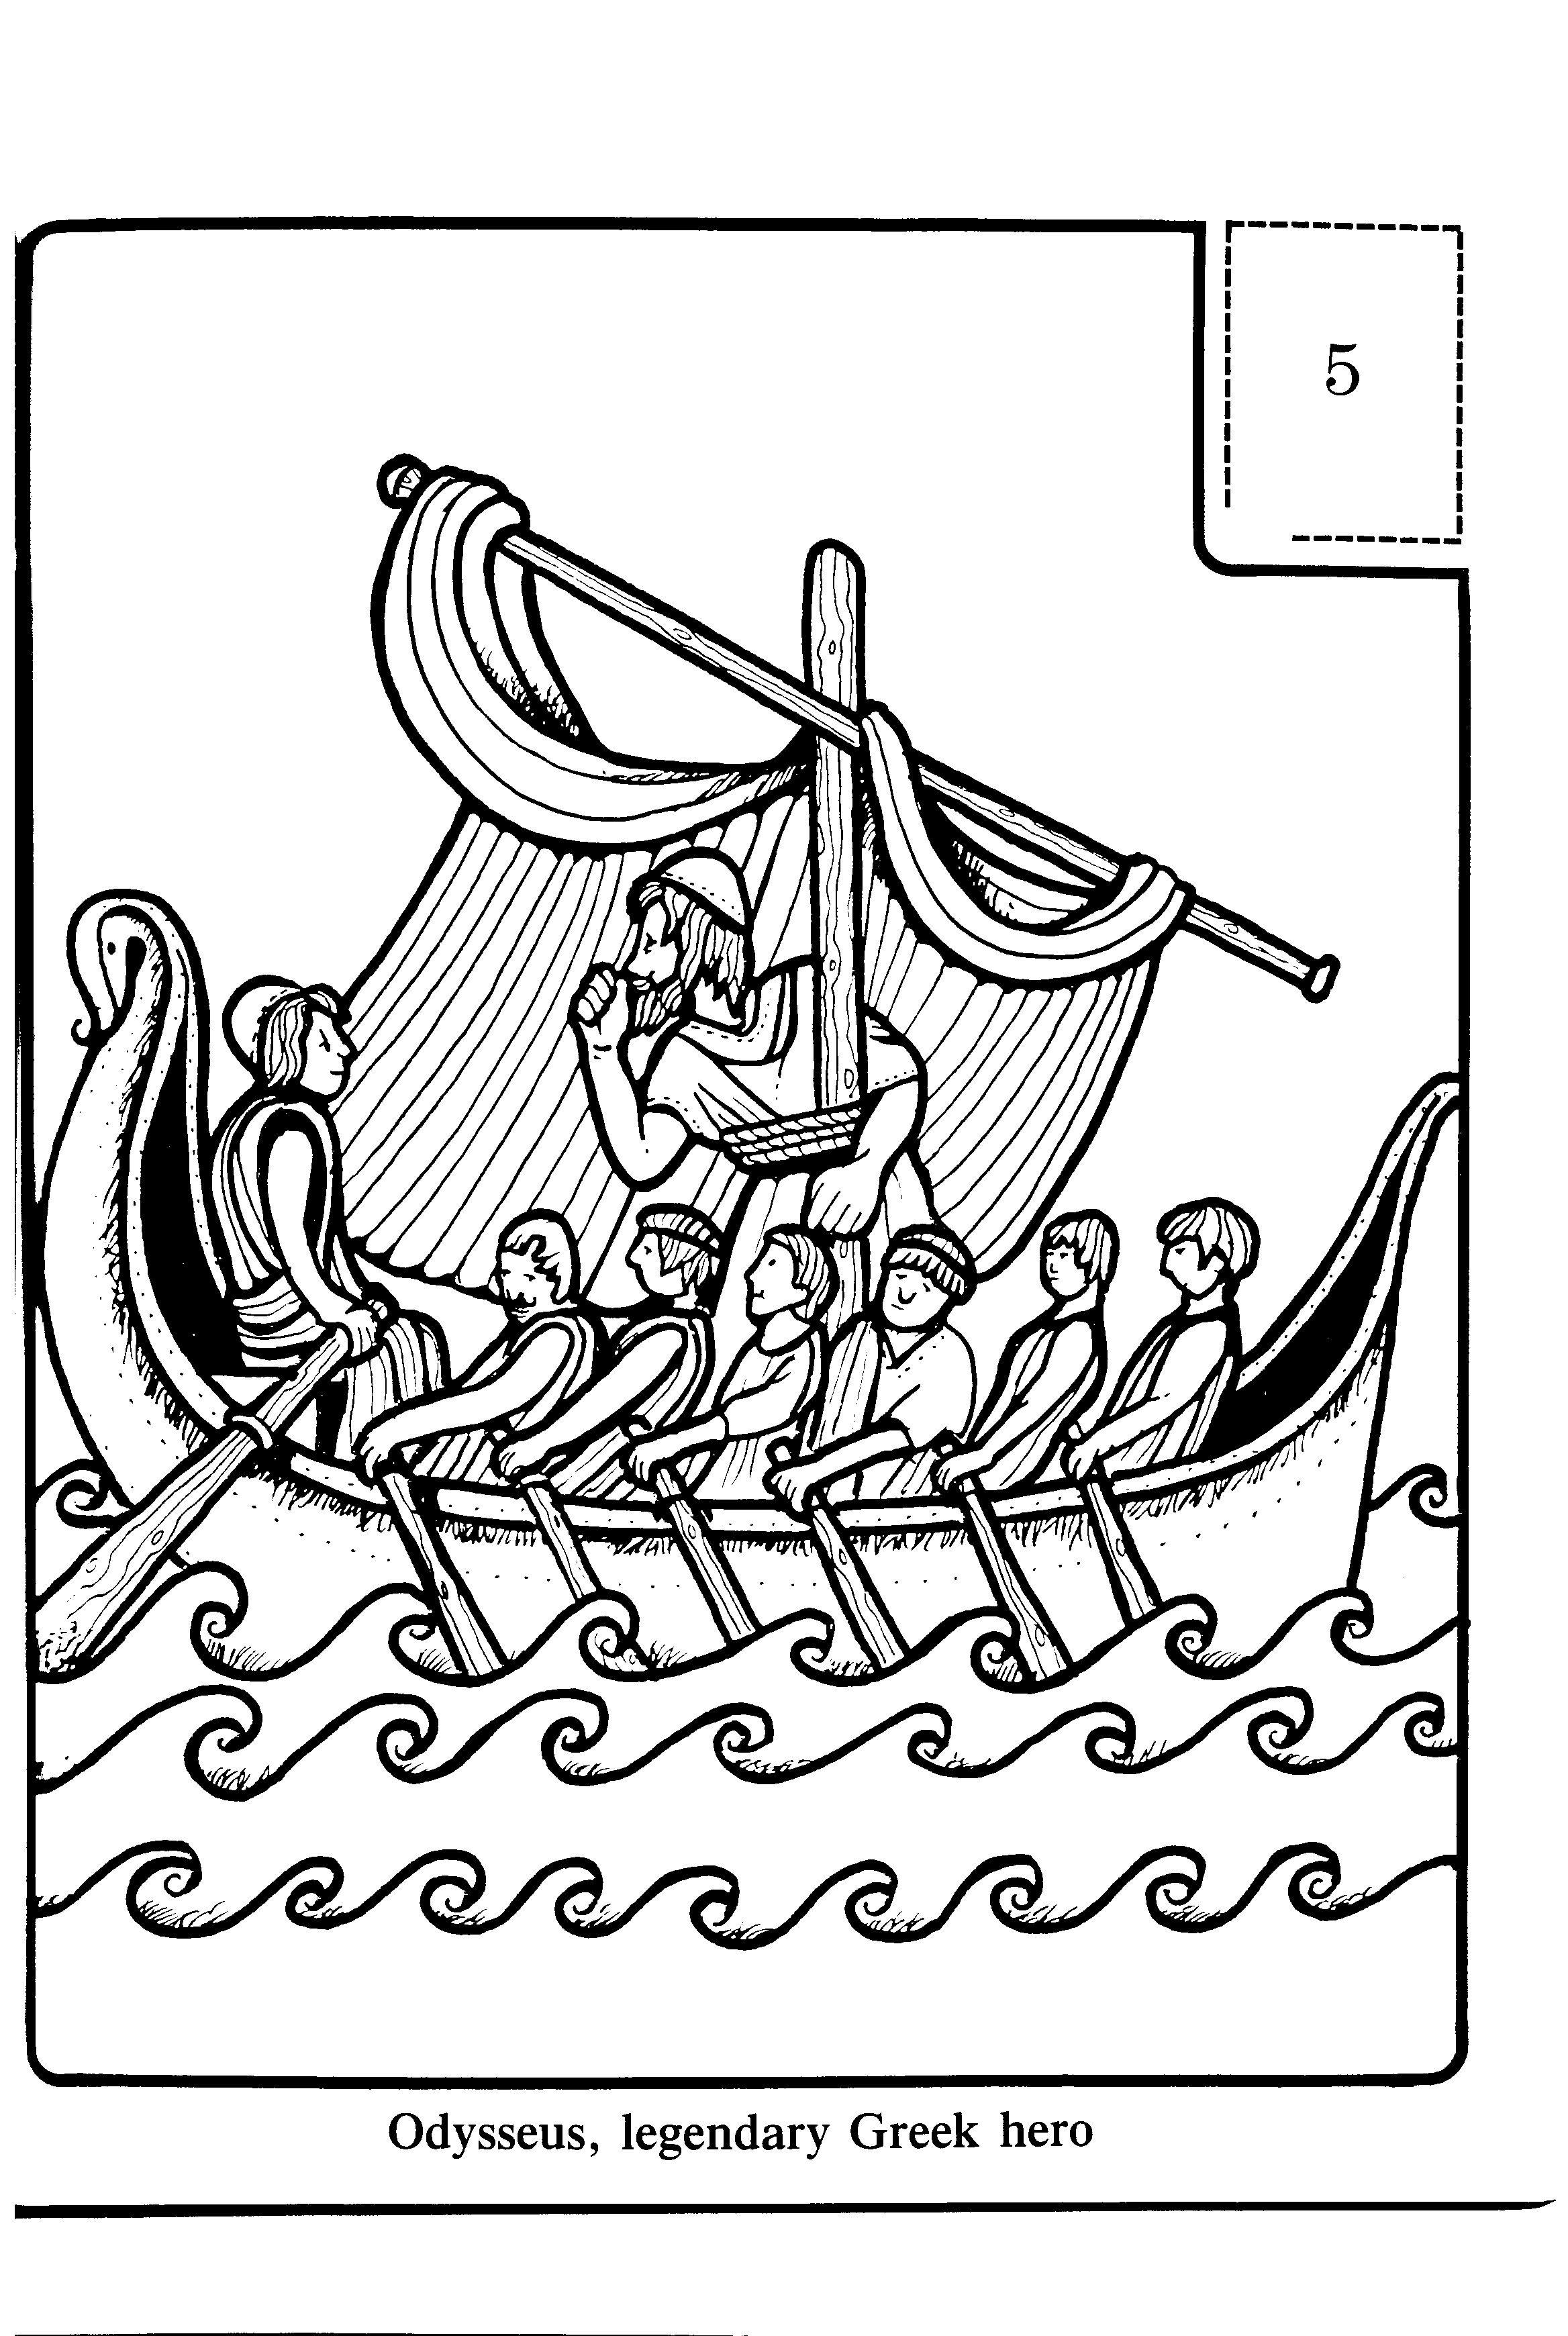 Odysseus Legendary Greek Hero